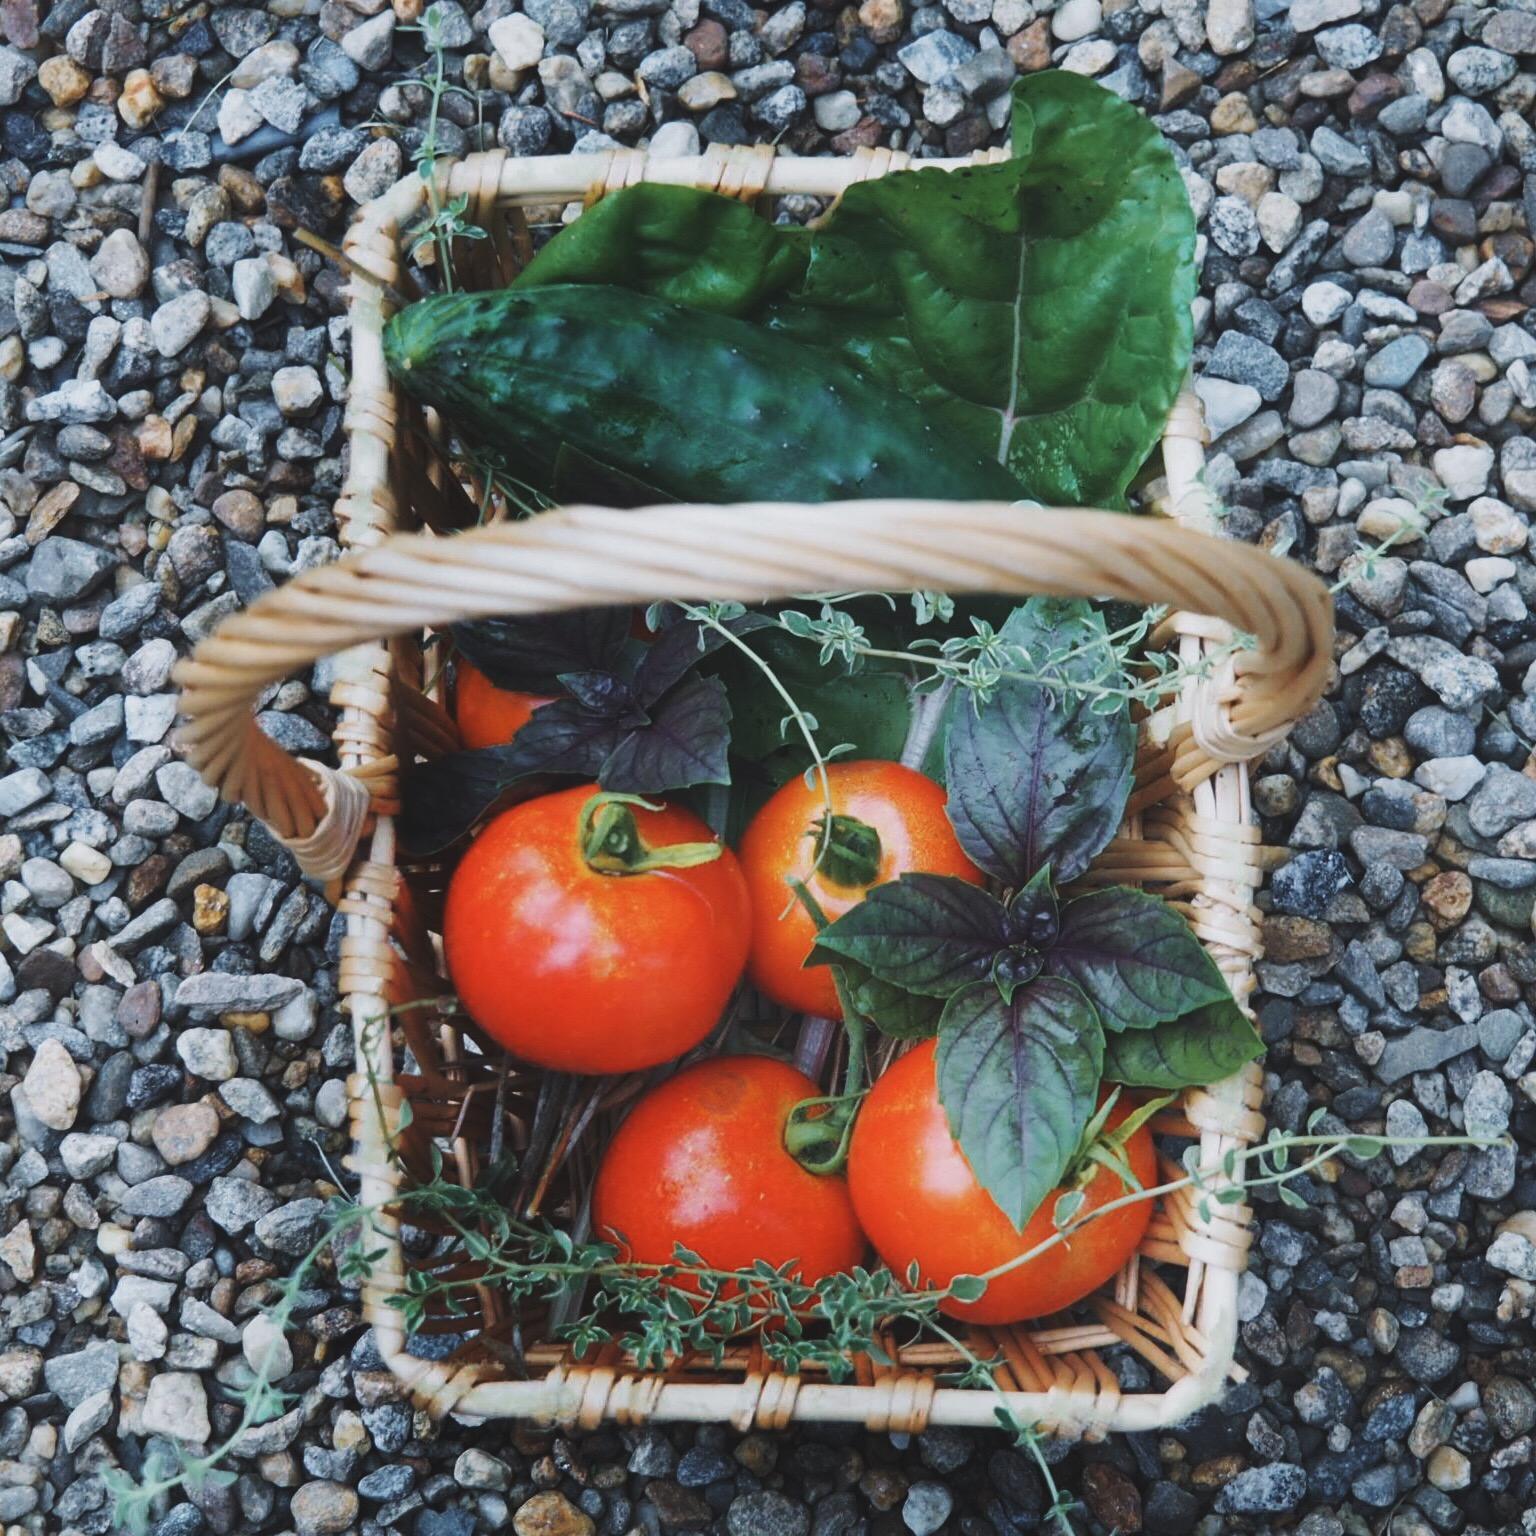 ripe tomato basket.JPG